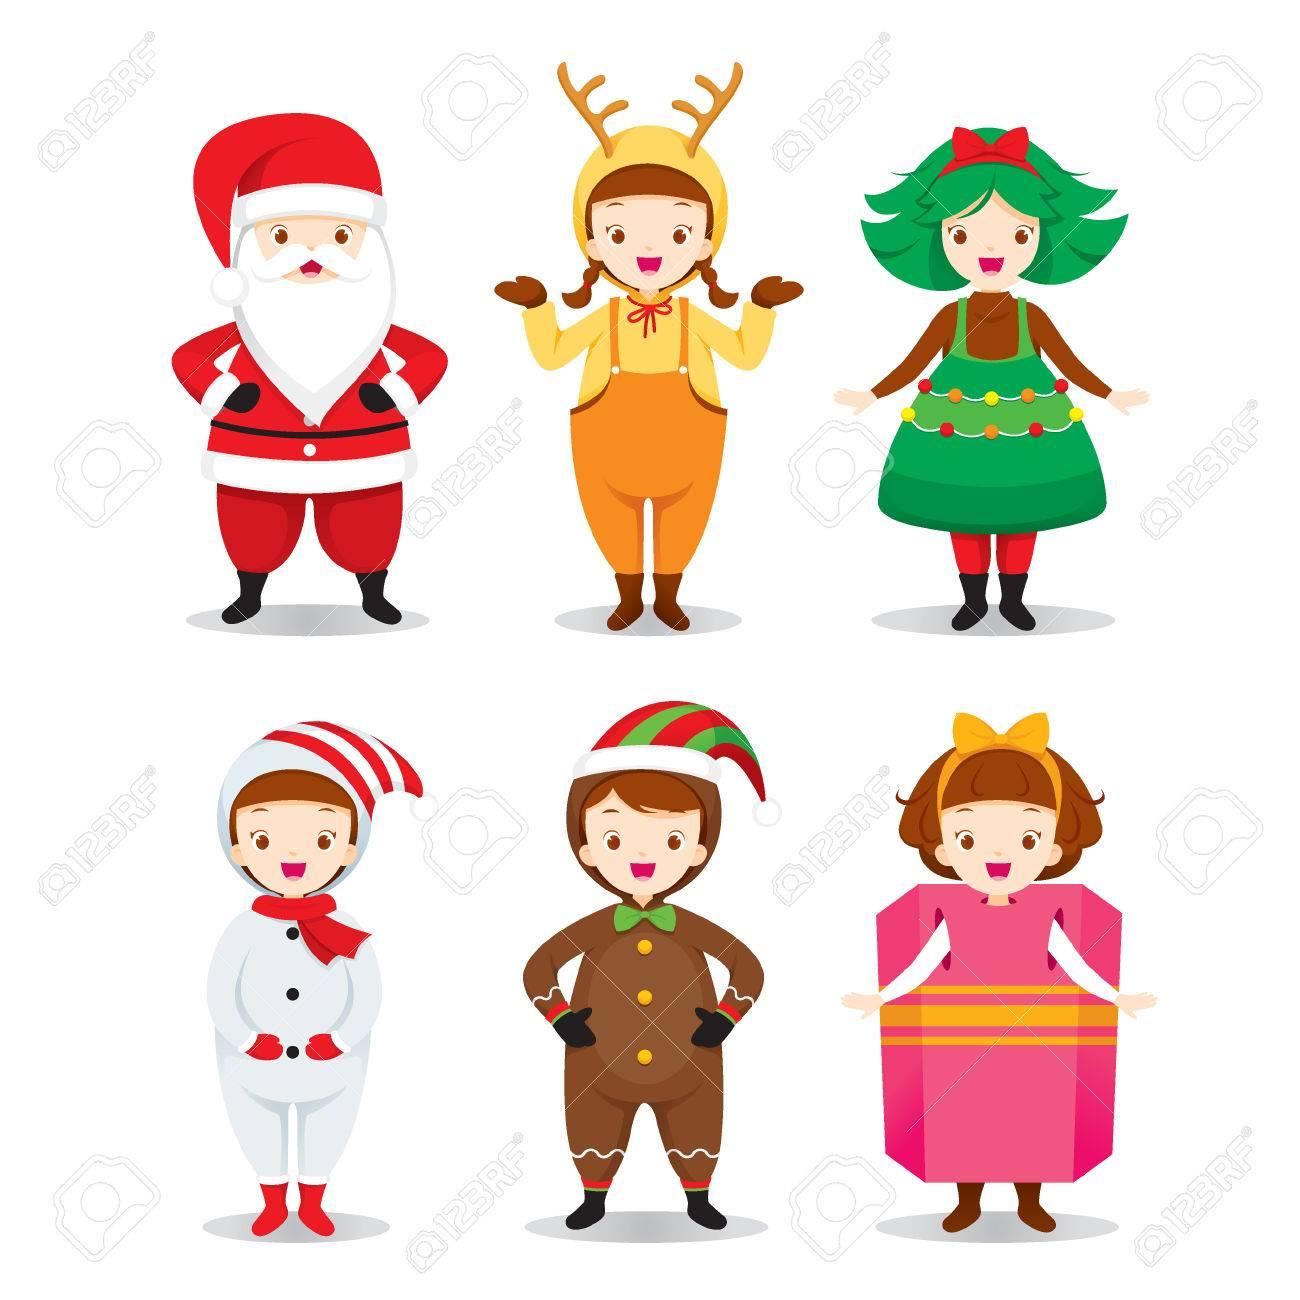 Kids Wearing Christmas Costumes Set, Xmas, Happy New Year, Clothing ...